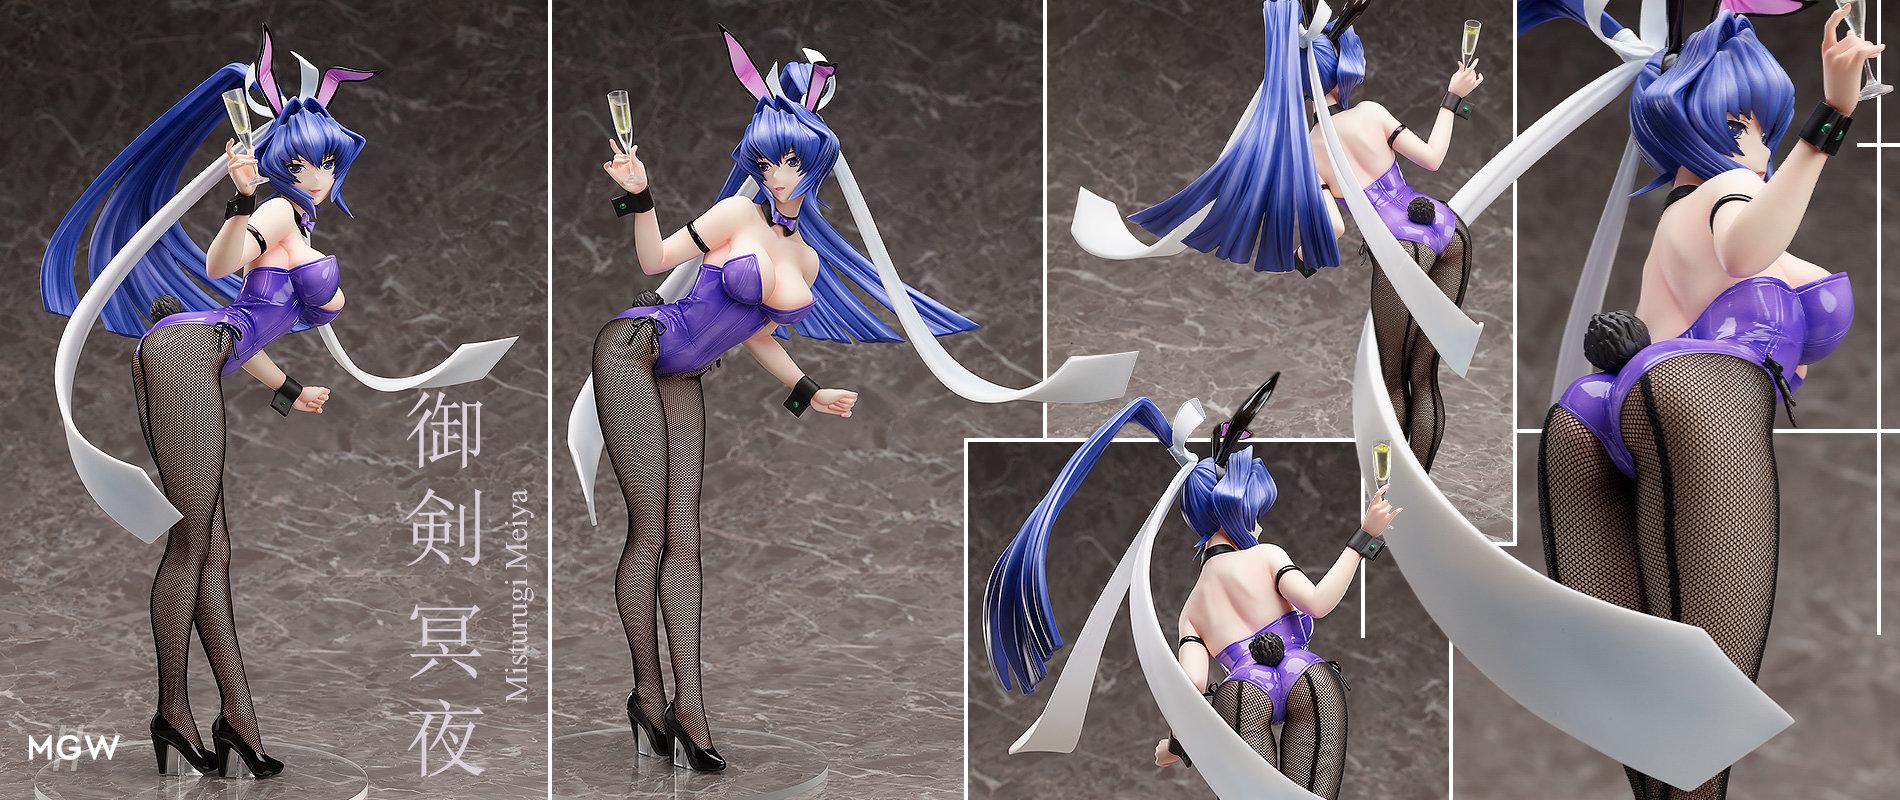 Mitsurugi Meiya Bunny Ver. by FREEing from Muv-Luv Alternative MyGrailWatch